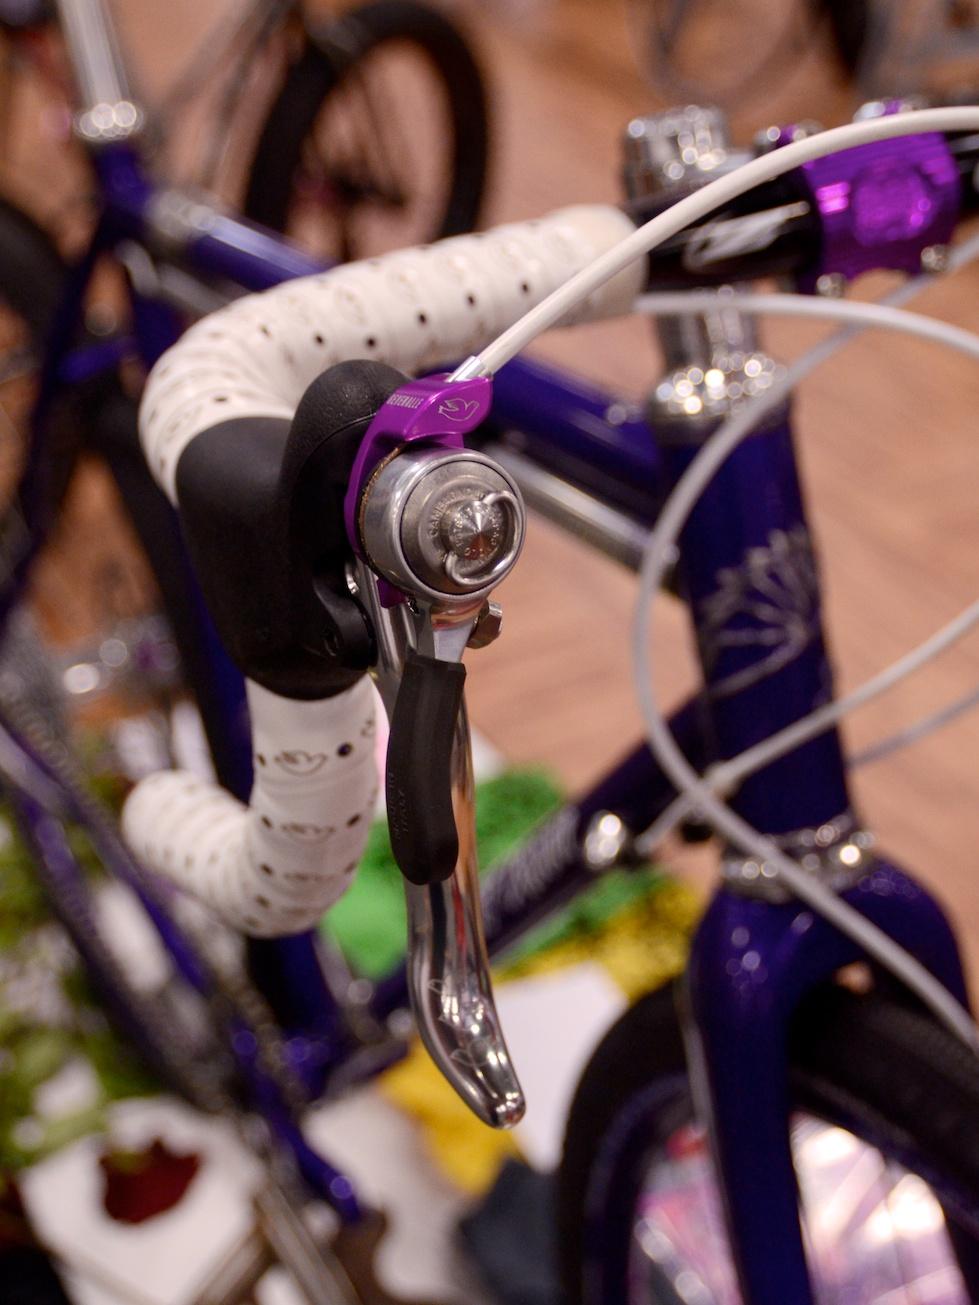 WEB-Princebike-Purple-reign-nahbs-2017-peacock-groove 17.jpg